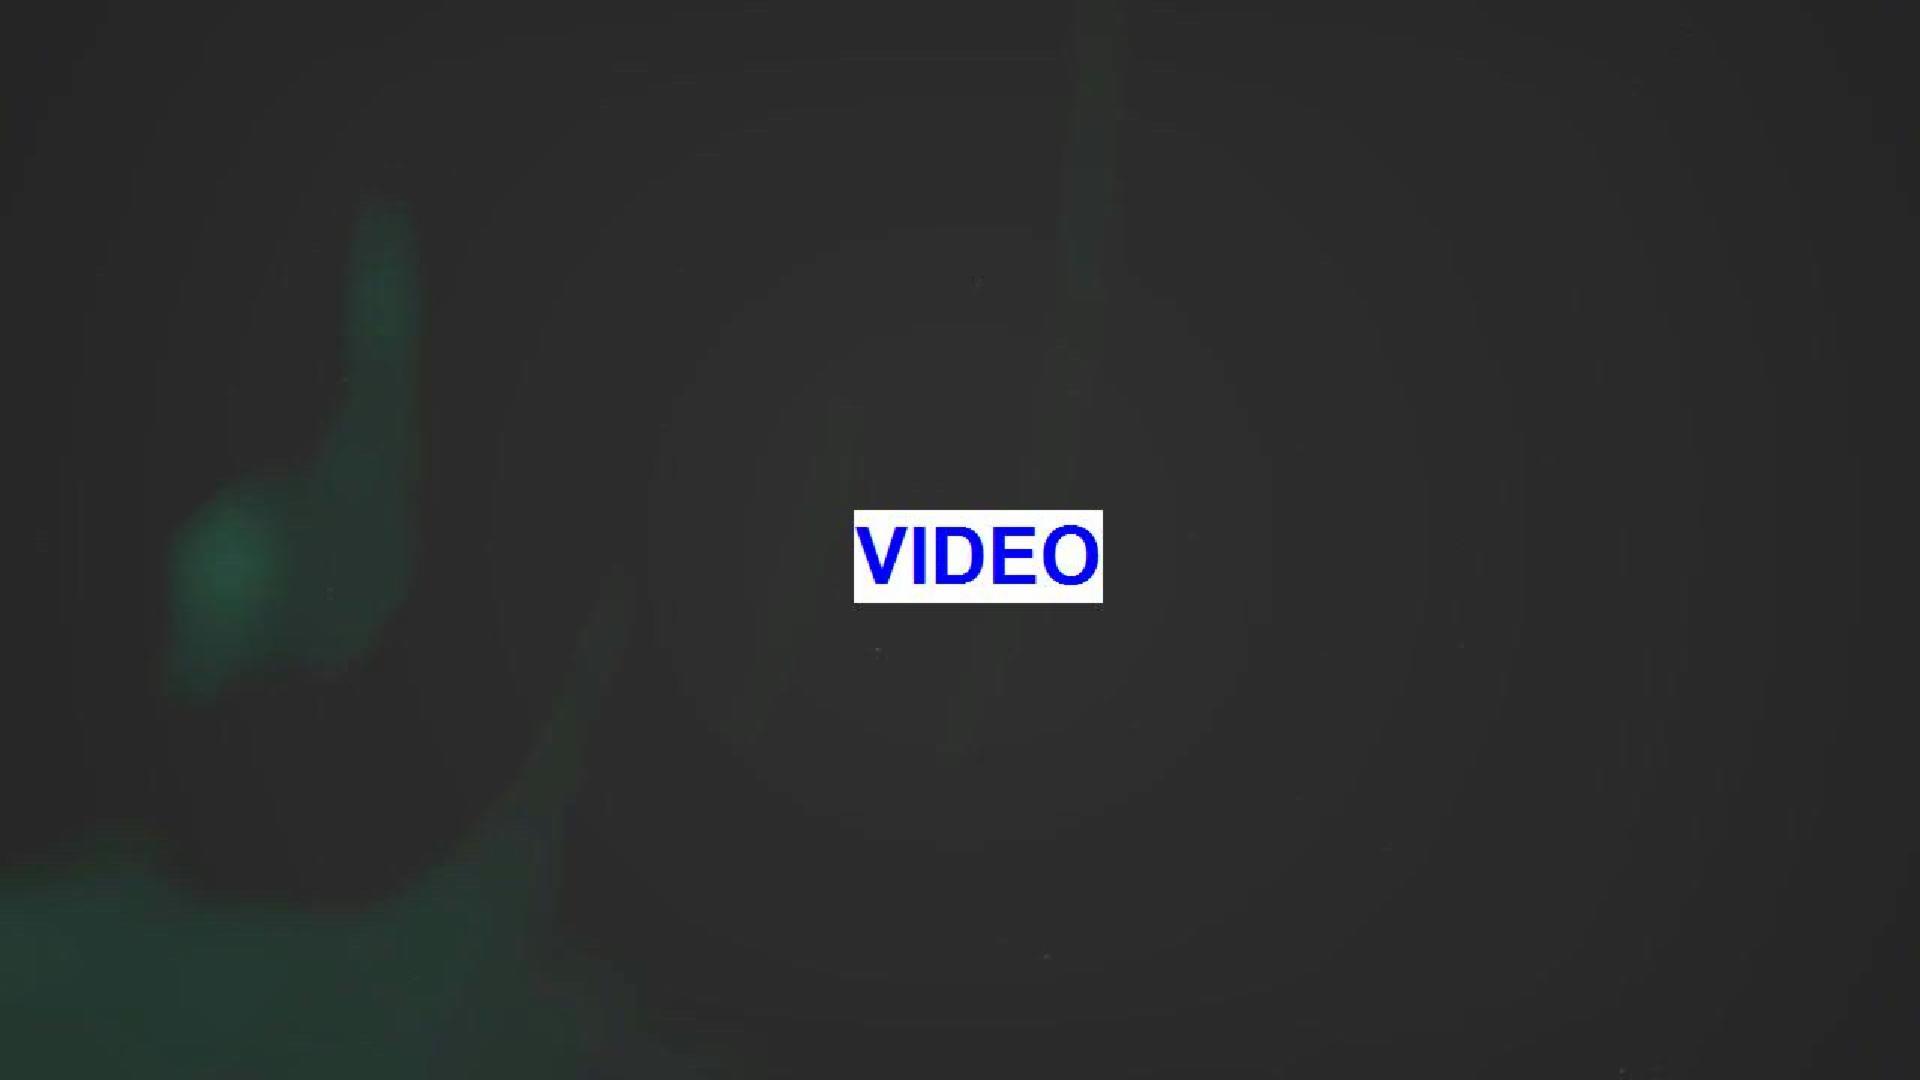 photographer: Andreas Wik, in photo: Andreas Hetland Olsen, Andreas Sætre, Andreas Wik, Jarle Risa, Jonas Johansson, Lasse Steinmoen, Sivert Jonassen, Stian Engelsvoll, Therese Johansen, Torstein Magnussen